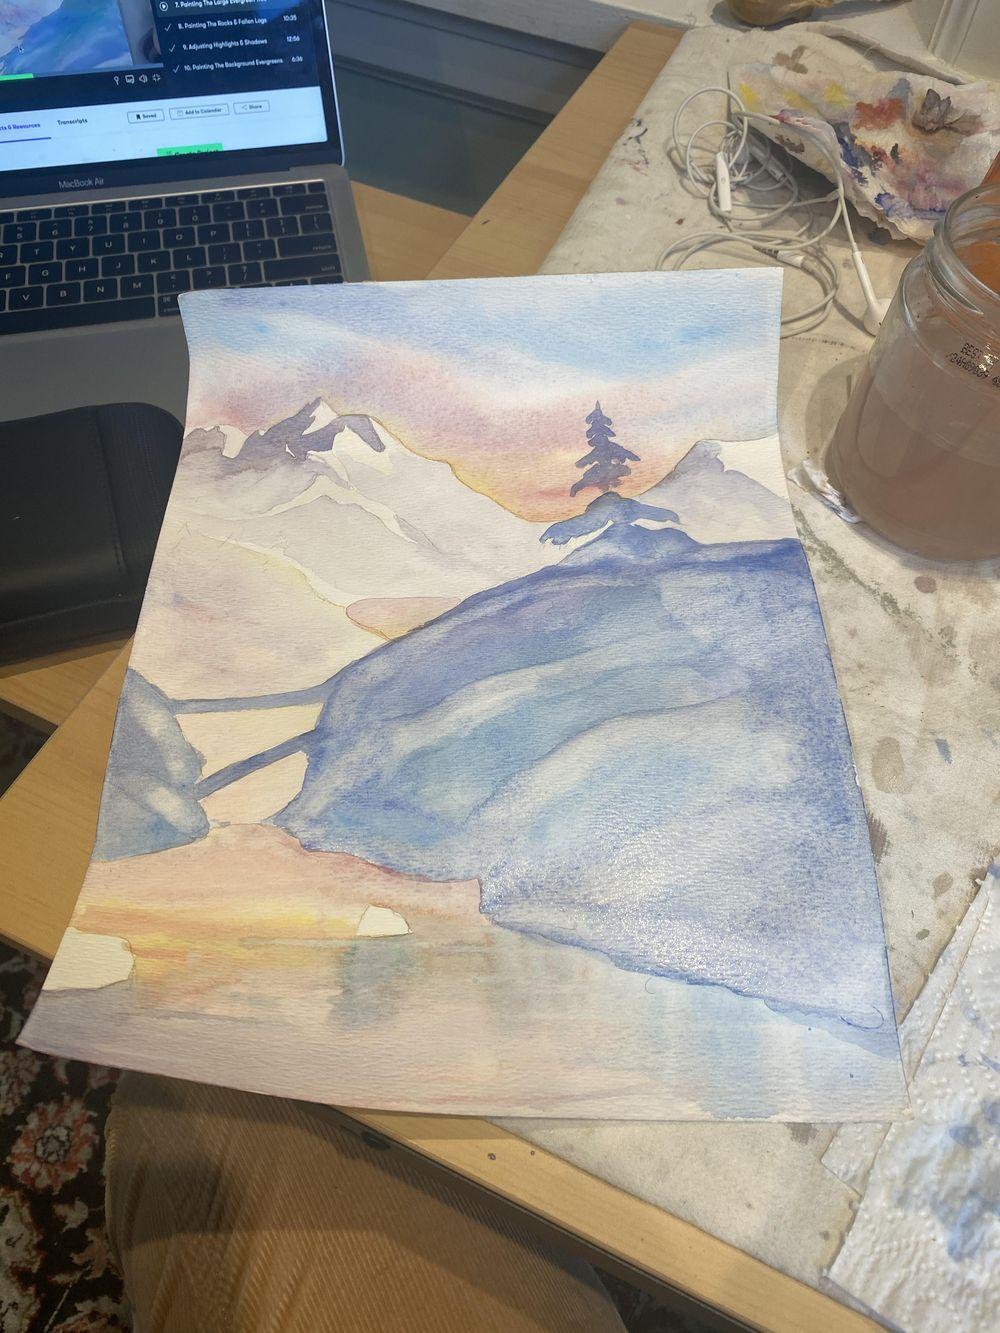 Sunset wintery landscape - image 1 - student project